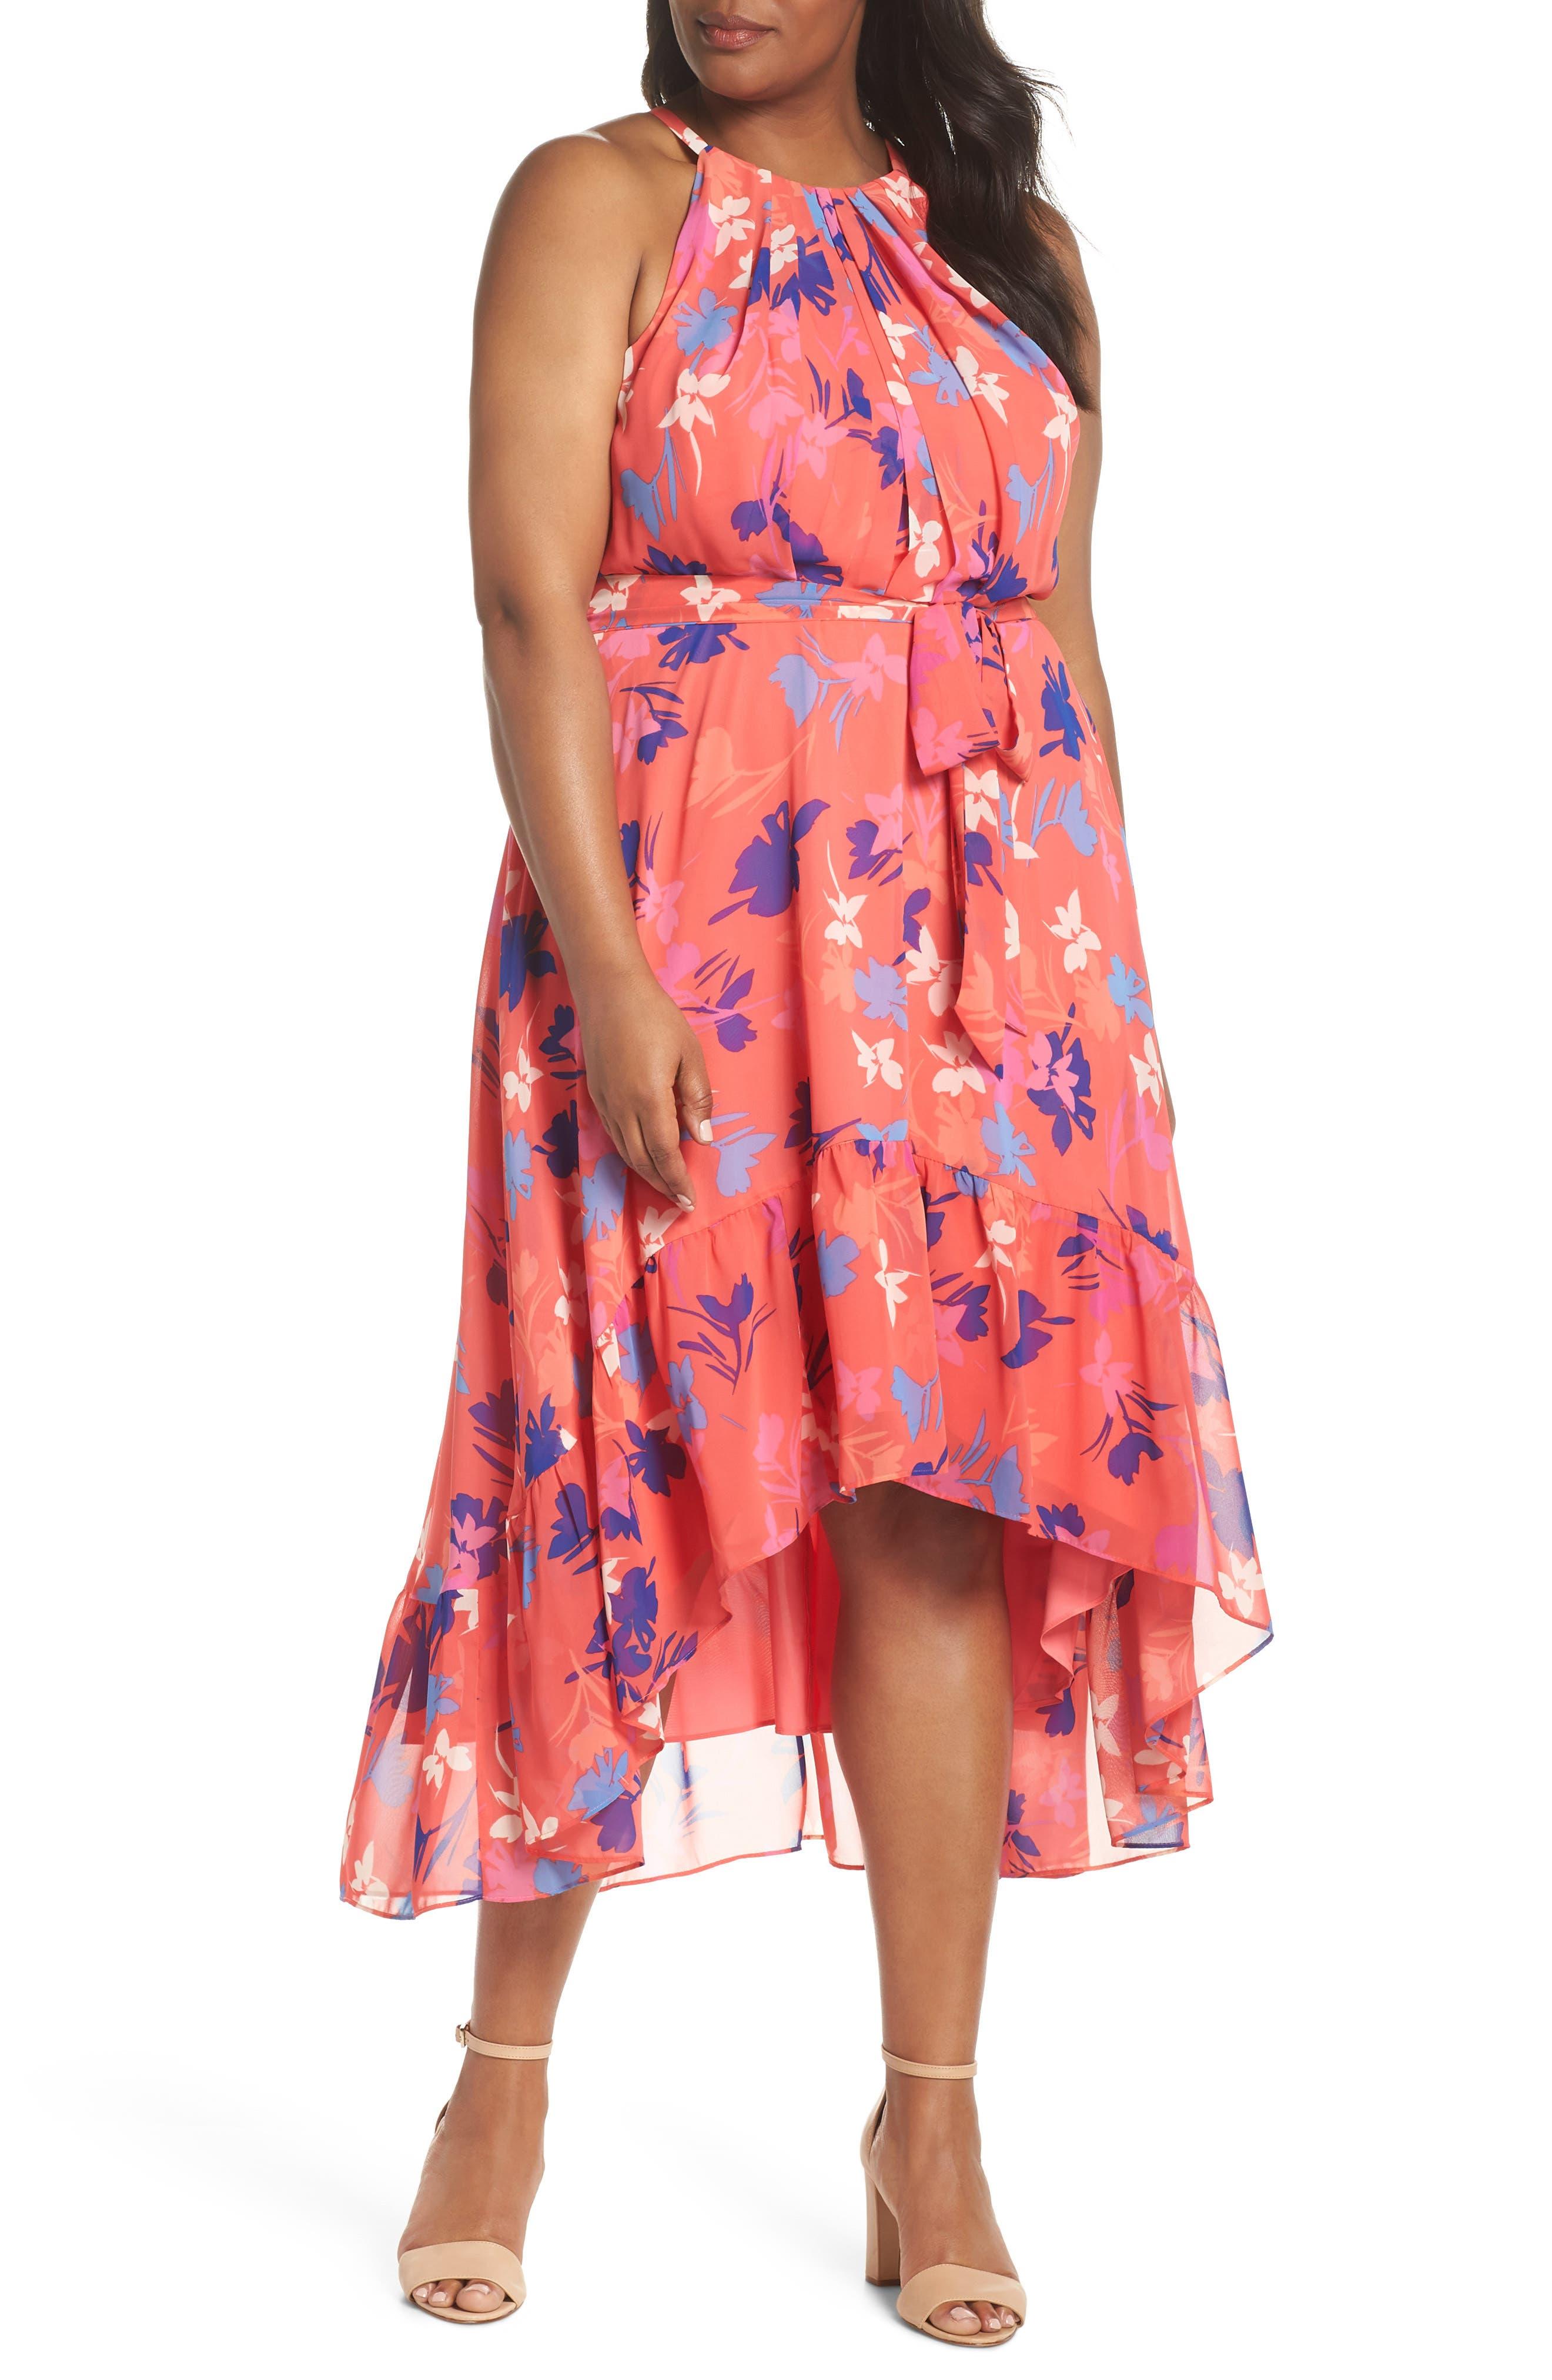 Vince Camuto Floral High/Low Halter Dress (Plus Size)